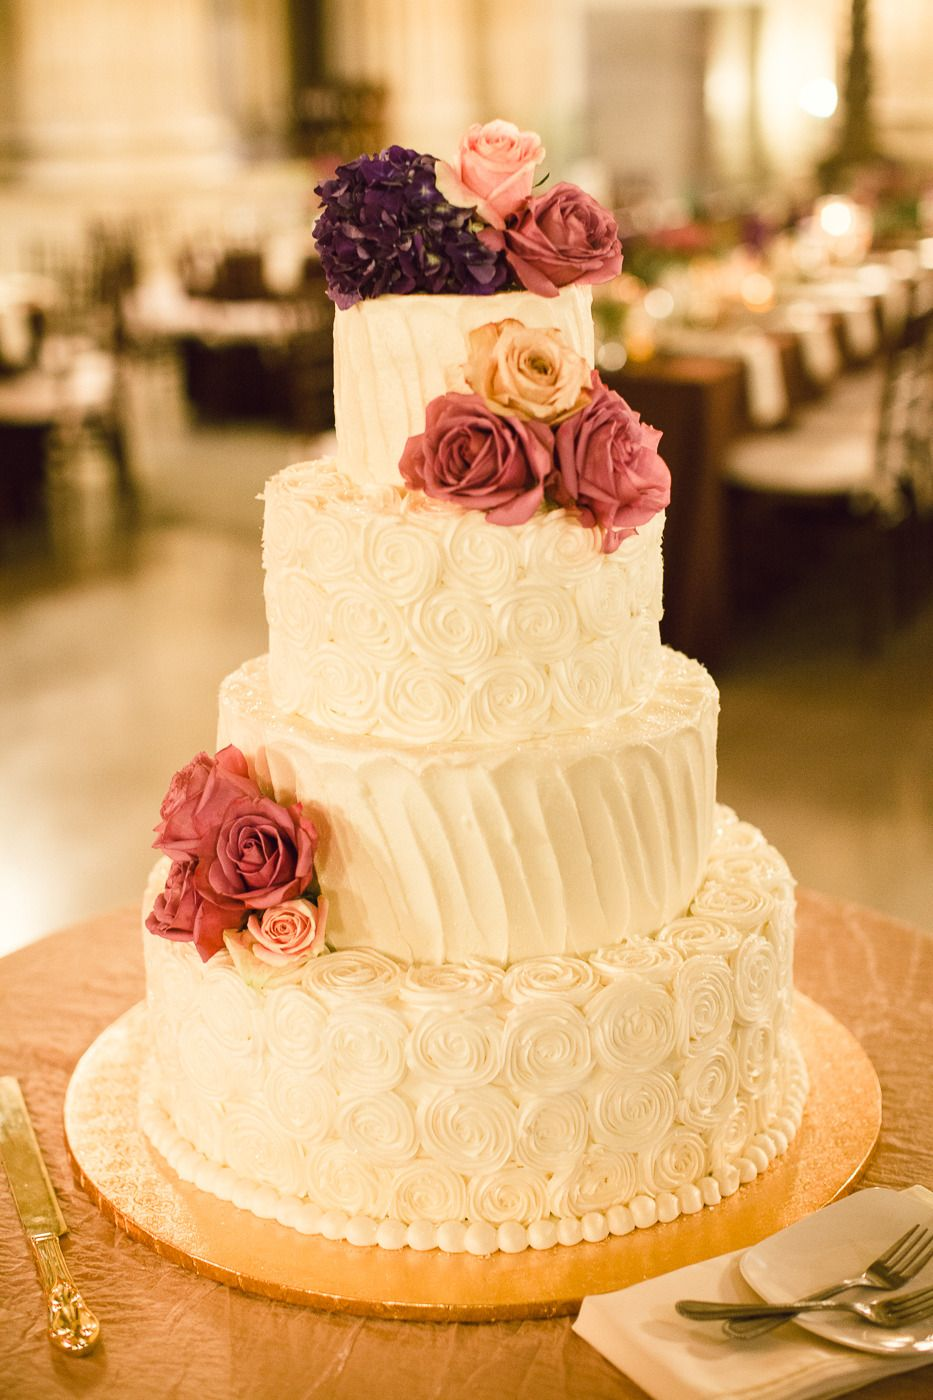 Cleveland City Hall Rotunda Wedding | Pinterest | Cleveland city ...